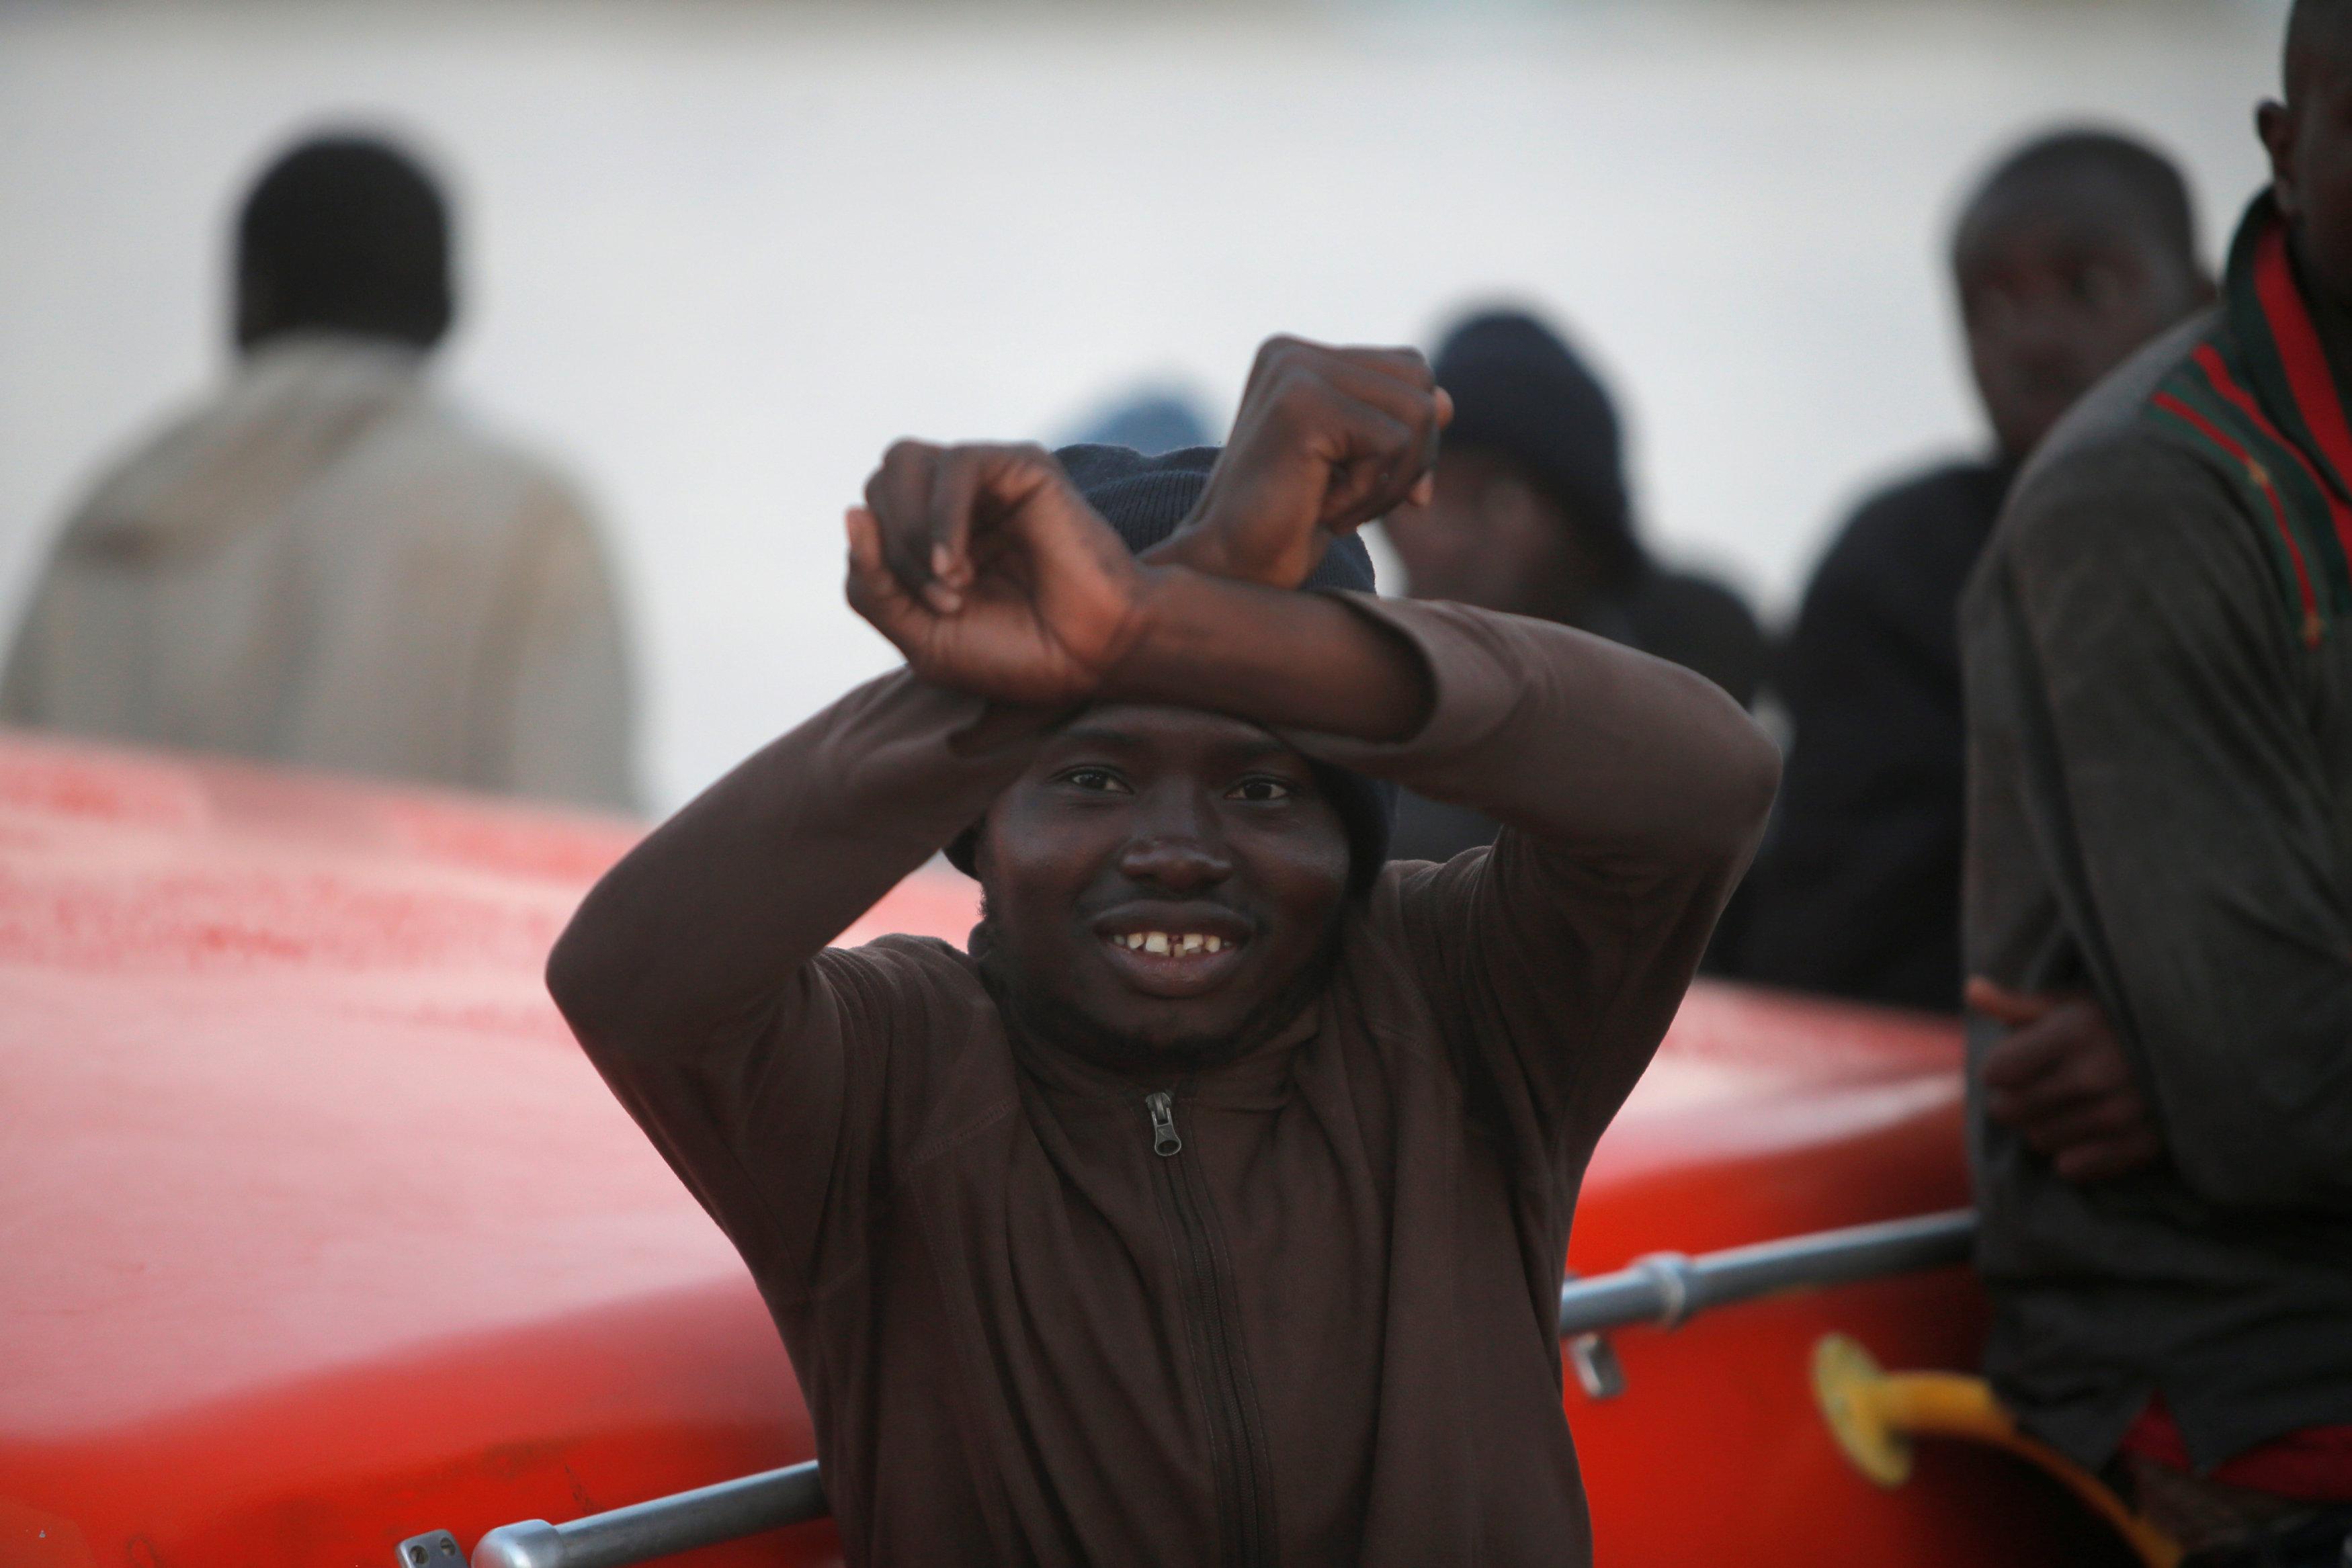 طفل مهاجر يشير بيده